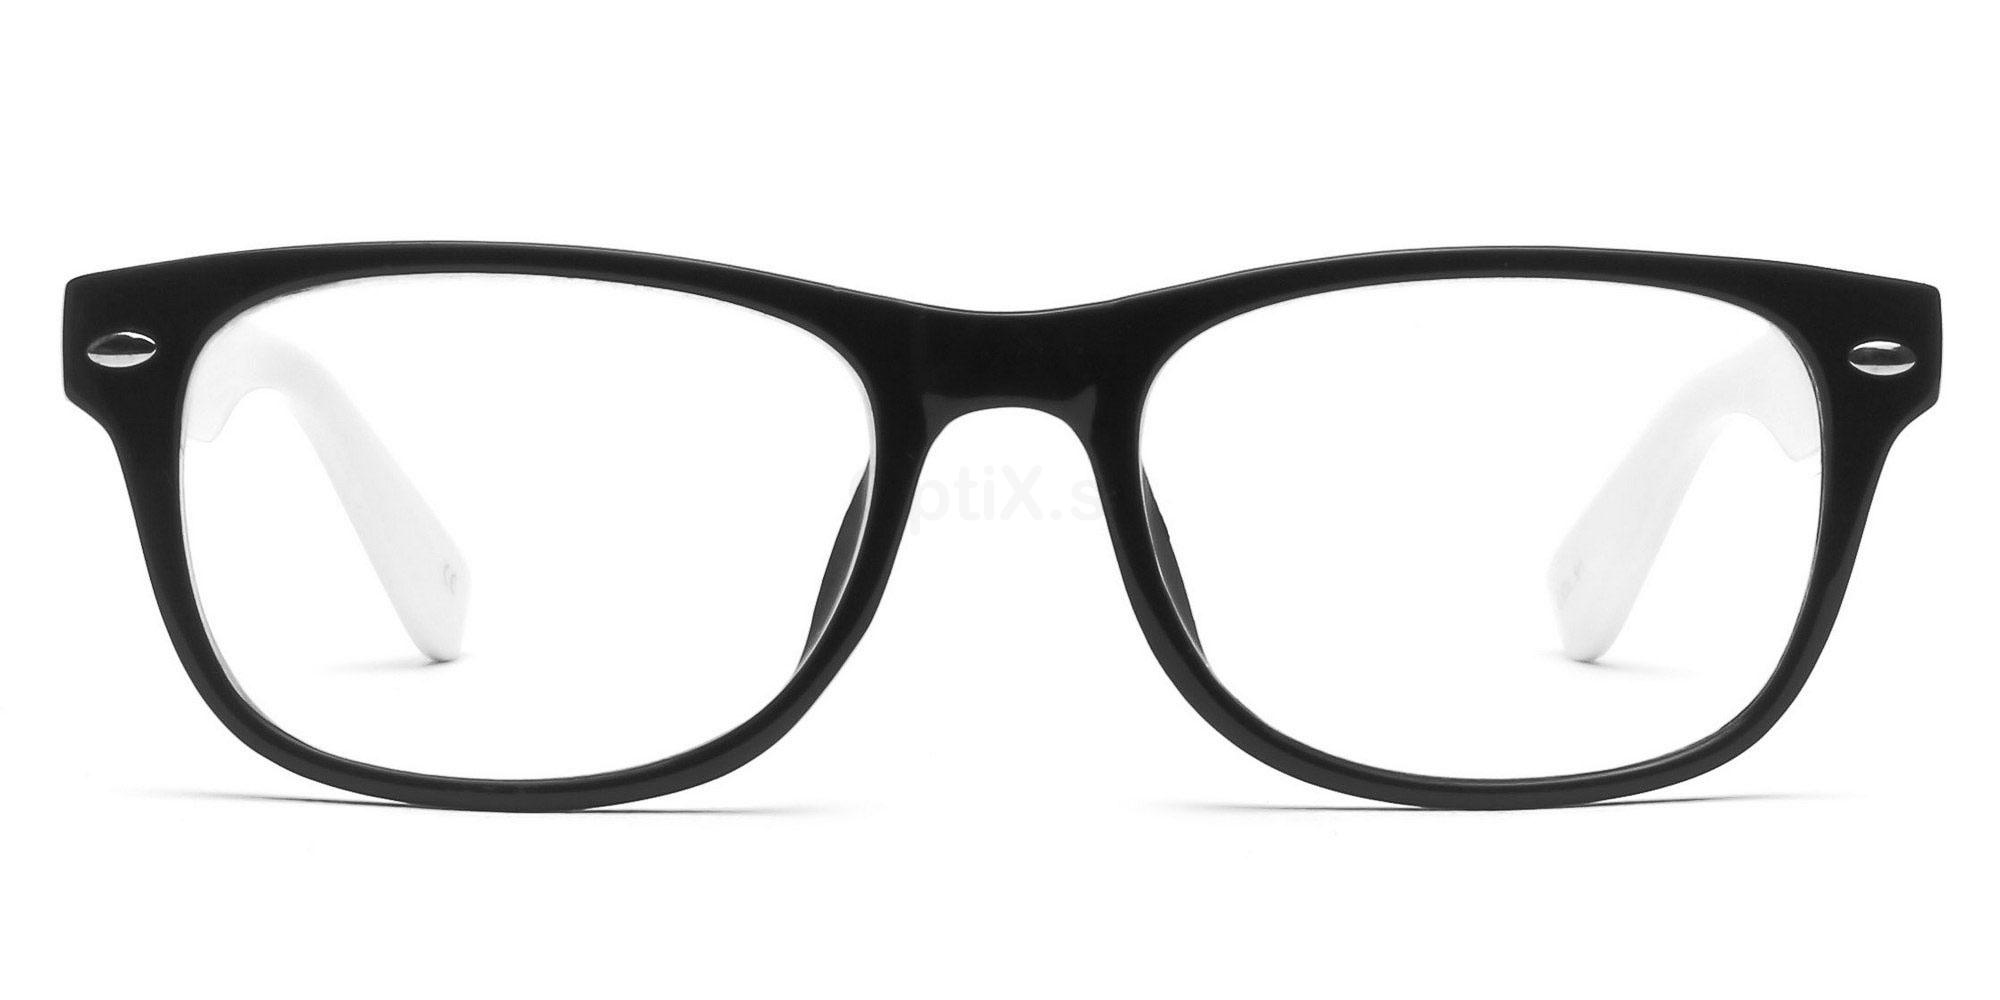 Black and White P2383 - Black and White Glasses, Savannah